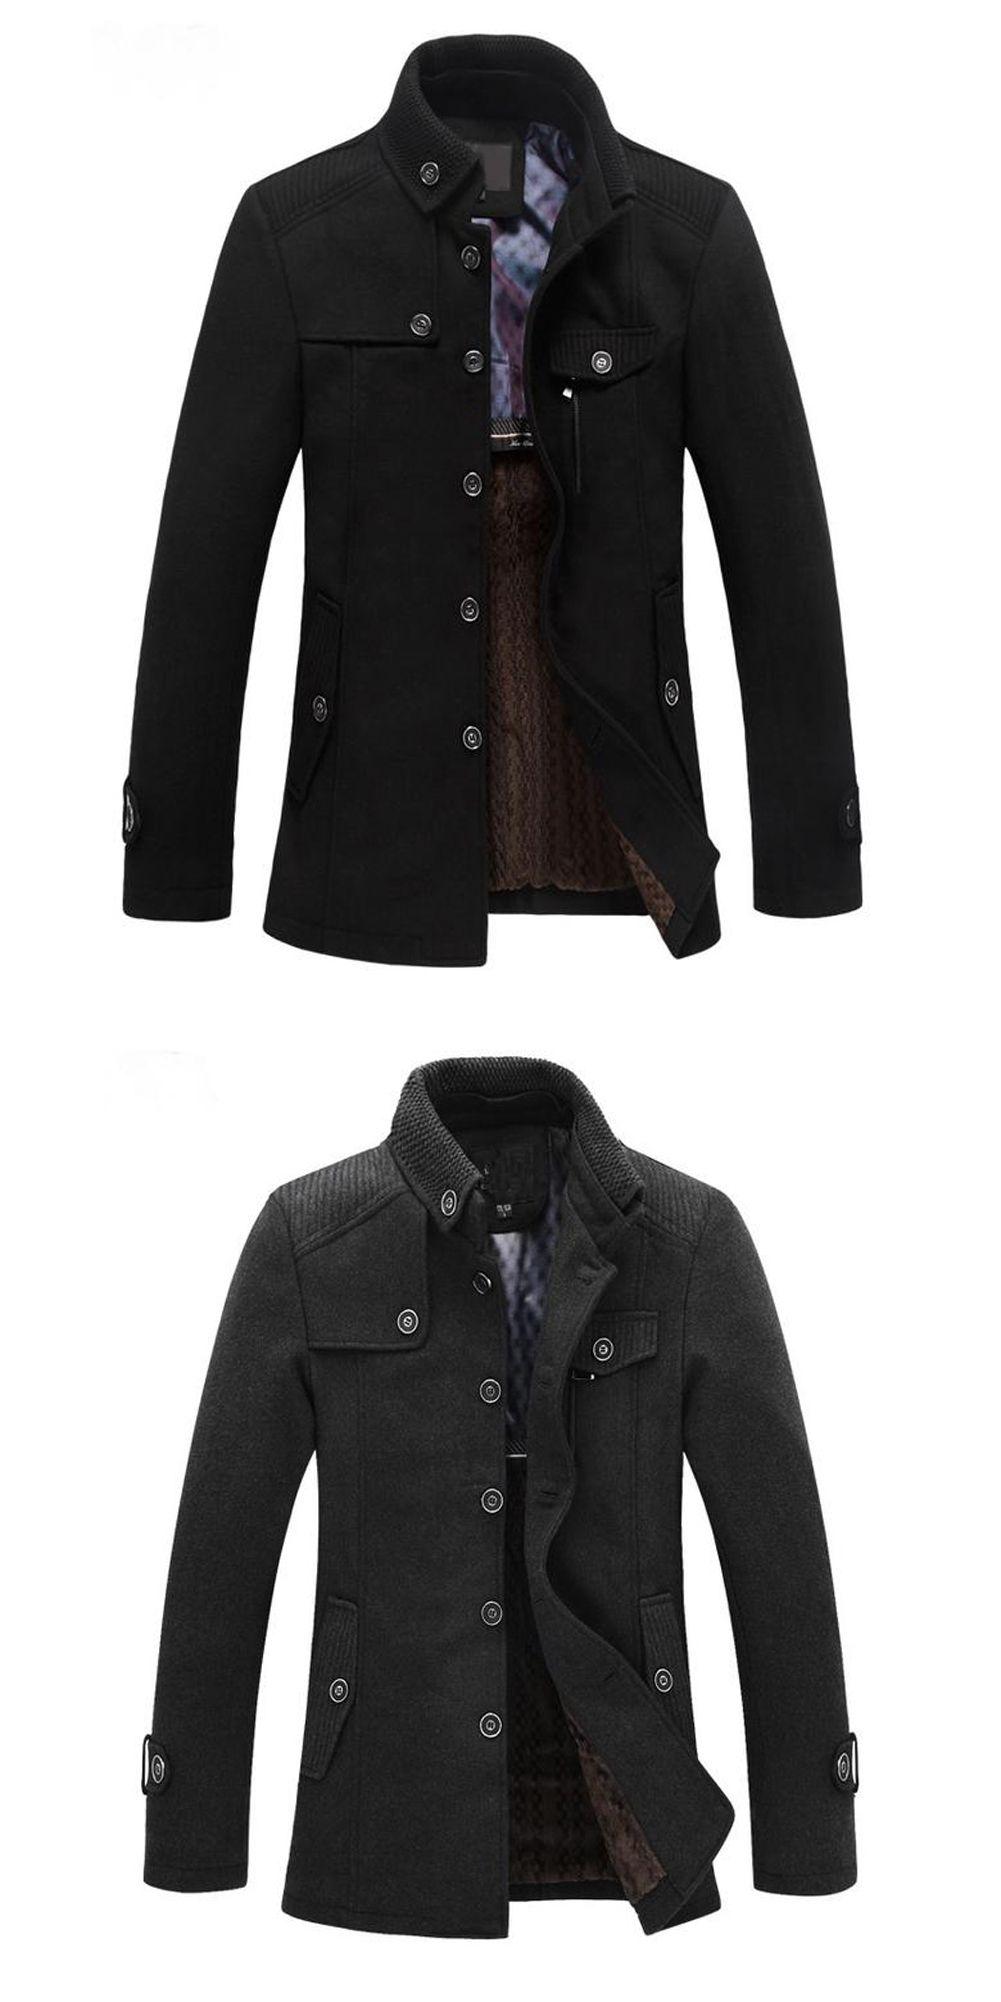 f9d48985452 SAF-Slim Fit Winter Trench Coat Wool Long Jacket Outerwear Overcoat ...